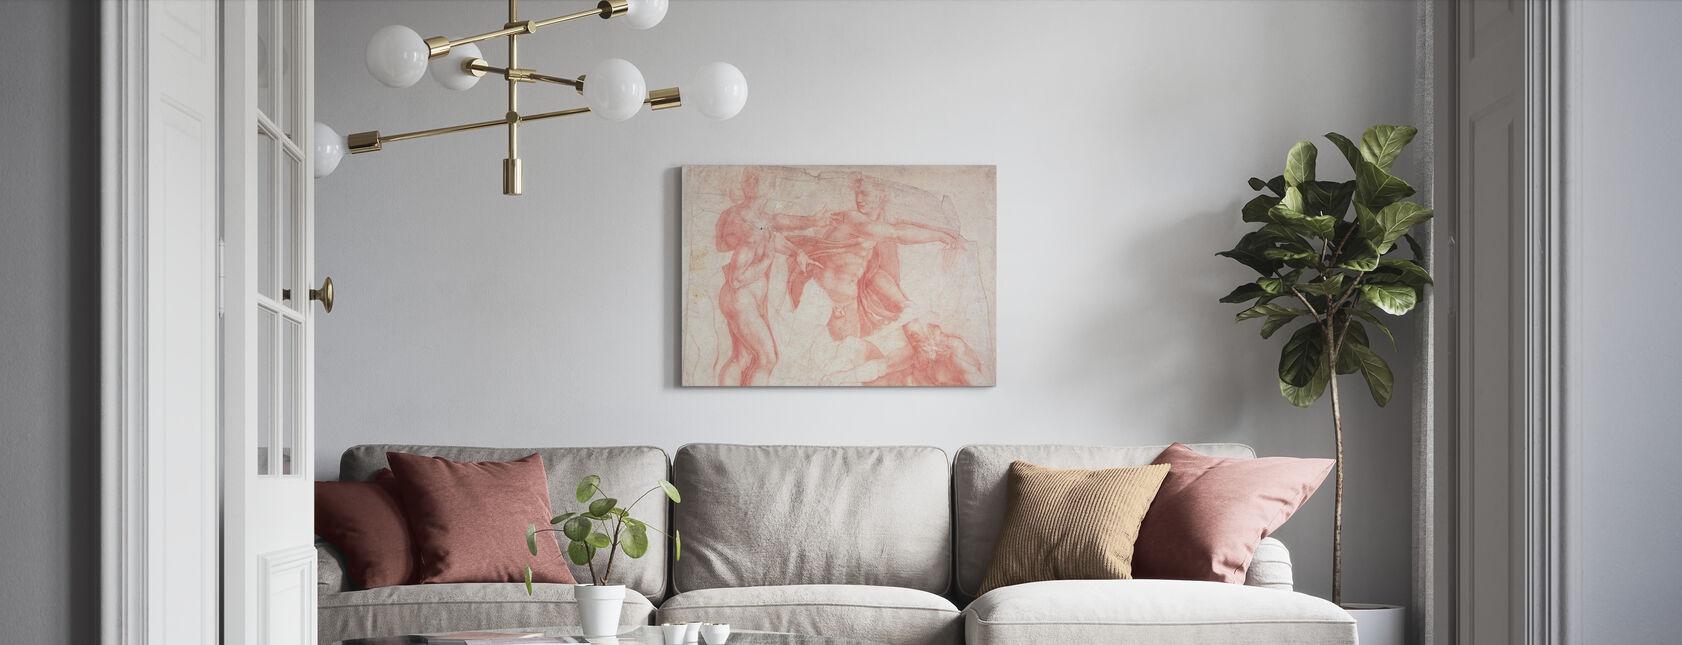 Studies of Male Nudes - Michelangelo Buonarroti - Canvas print - Living Room